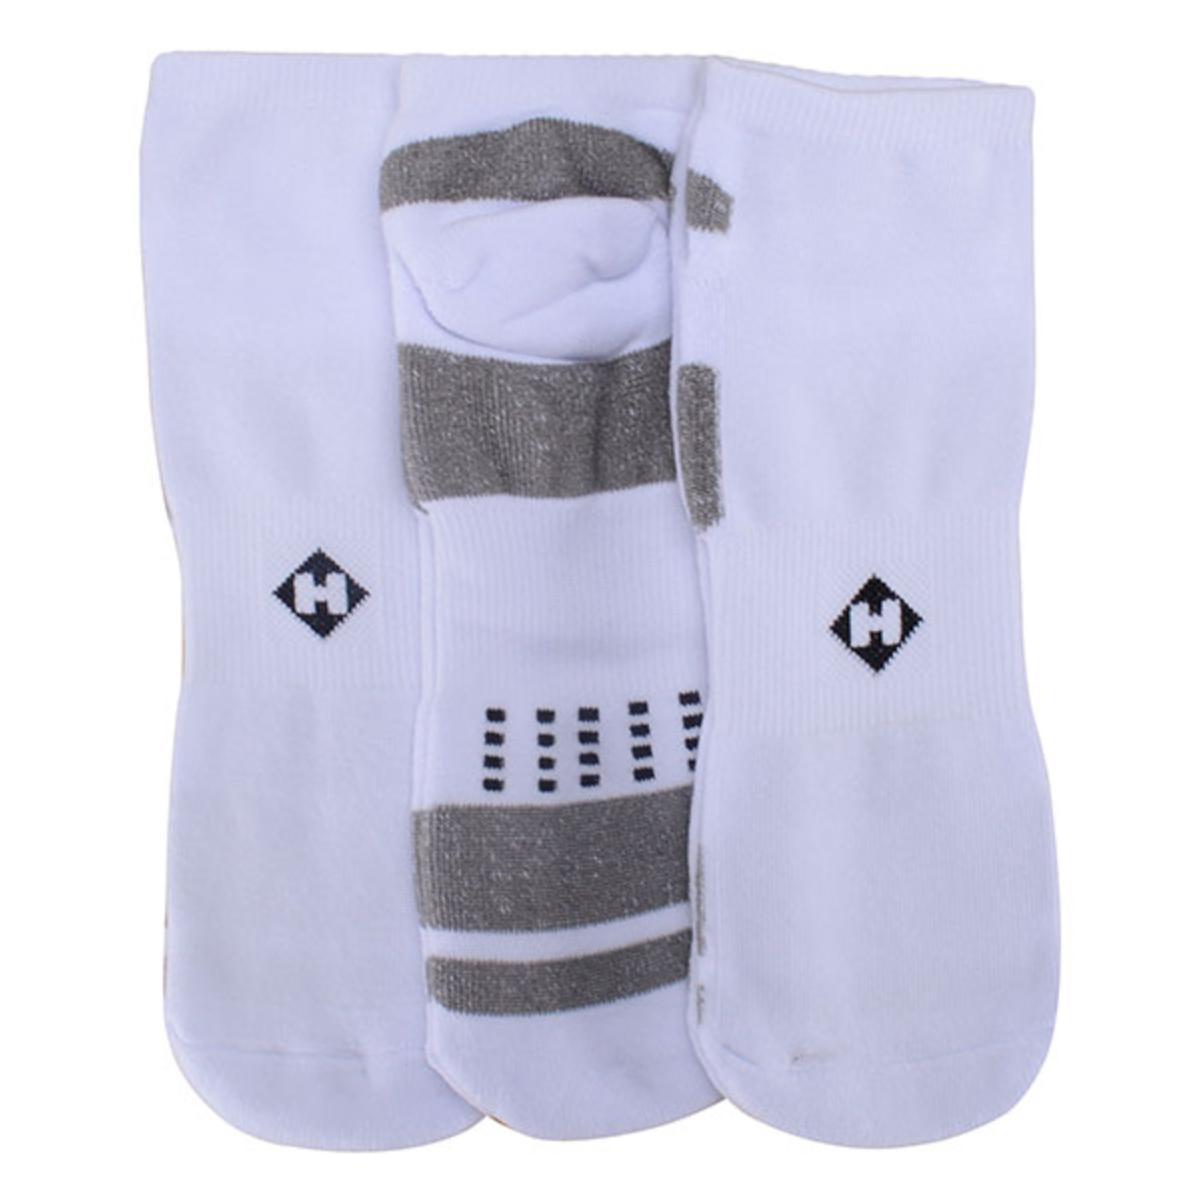 Meia Masculina Hoahi Hmc18006b Kit C/3 Branco/cinza